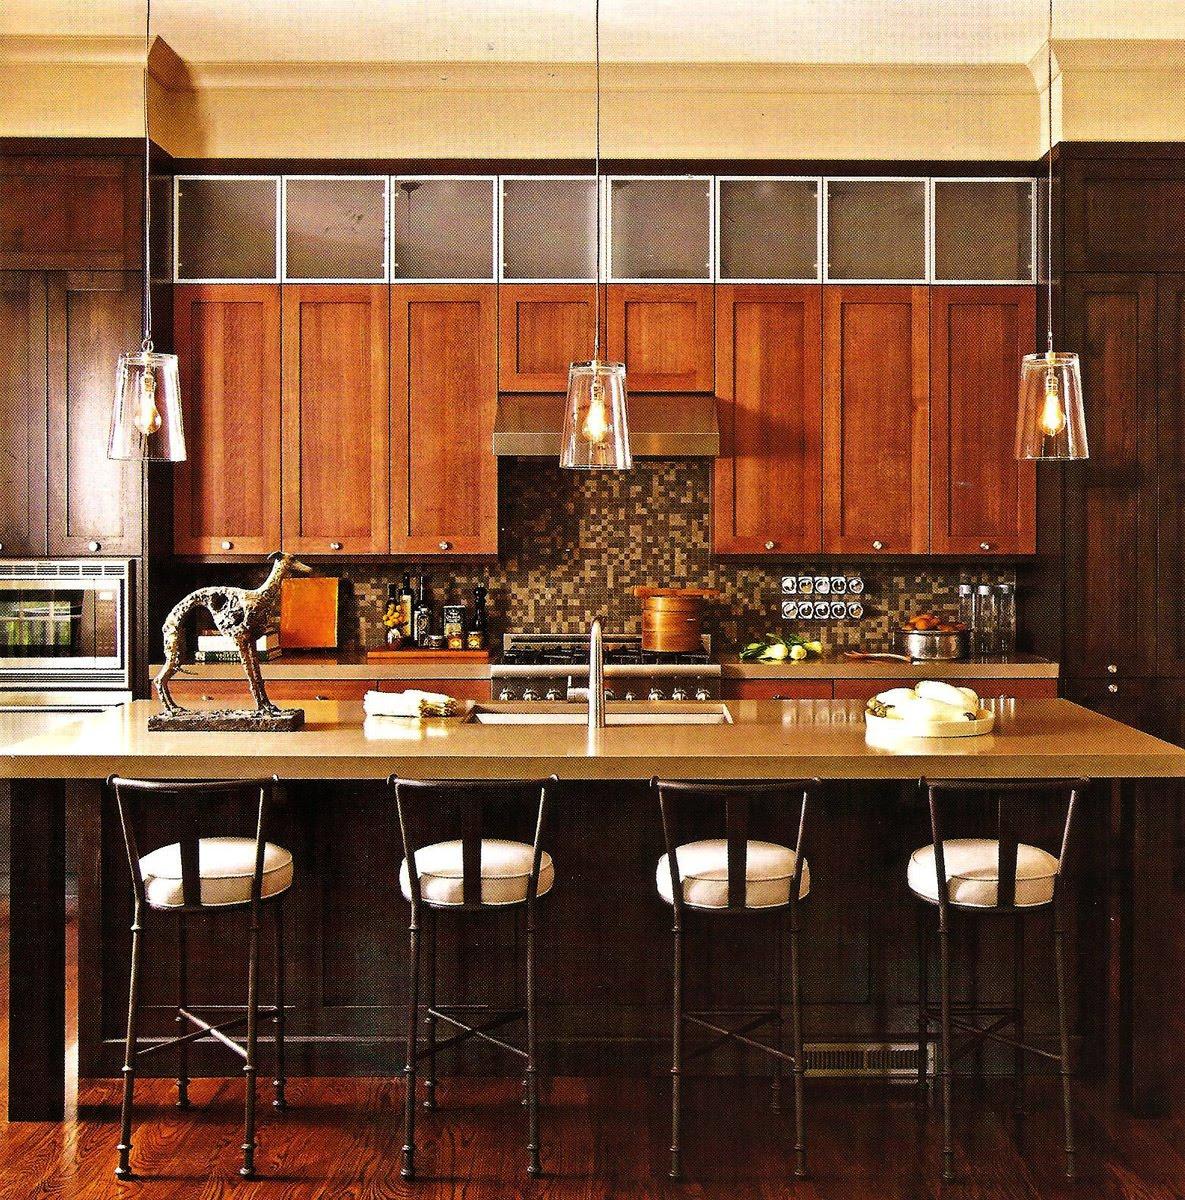 George interior design tuesday terms edison bulb for 2 kitchen ct edison nj